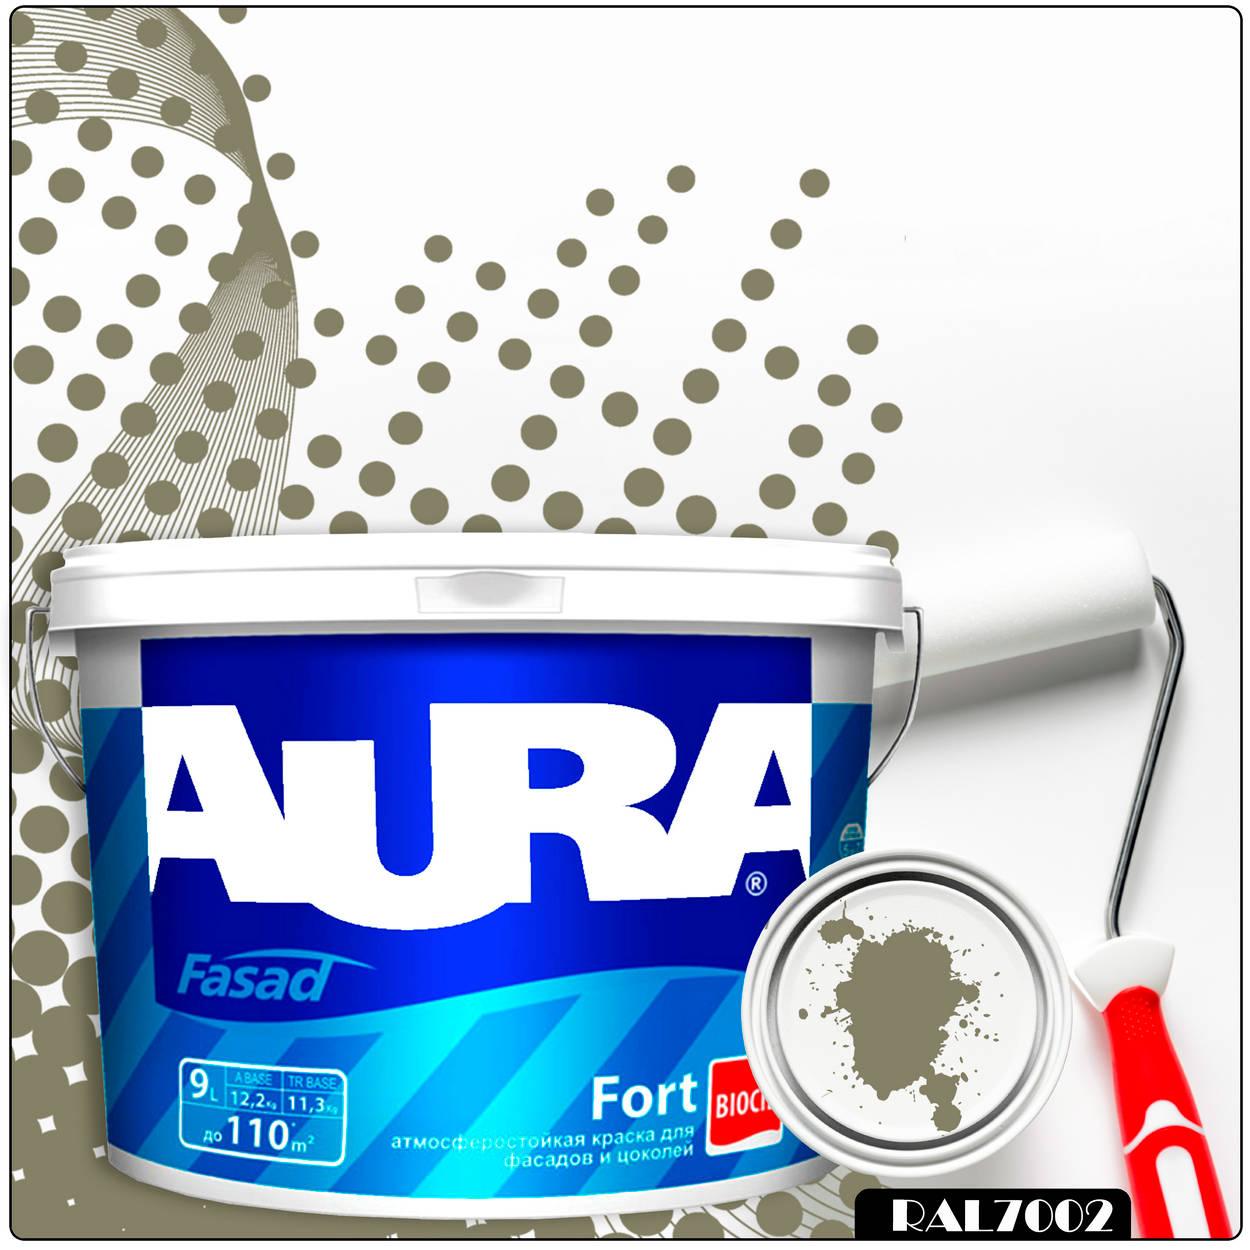 Фото 2 - Краска Aura Fasad Fort, RAL 7002 Оливково-серый, латексная, матовая, для фасада и цоколей, 9л, Аура.